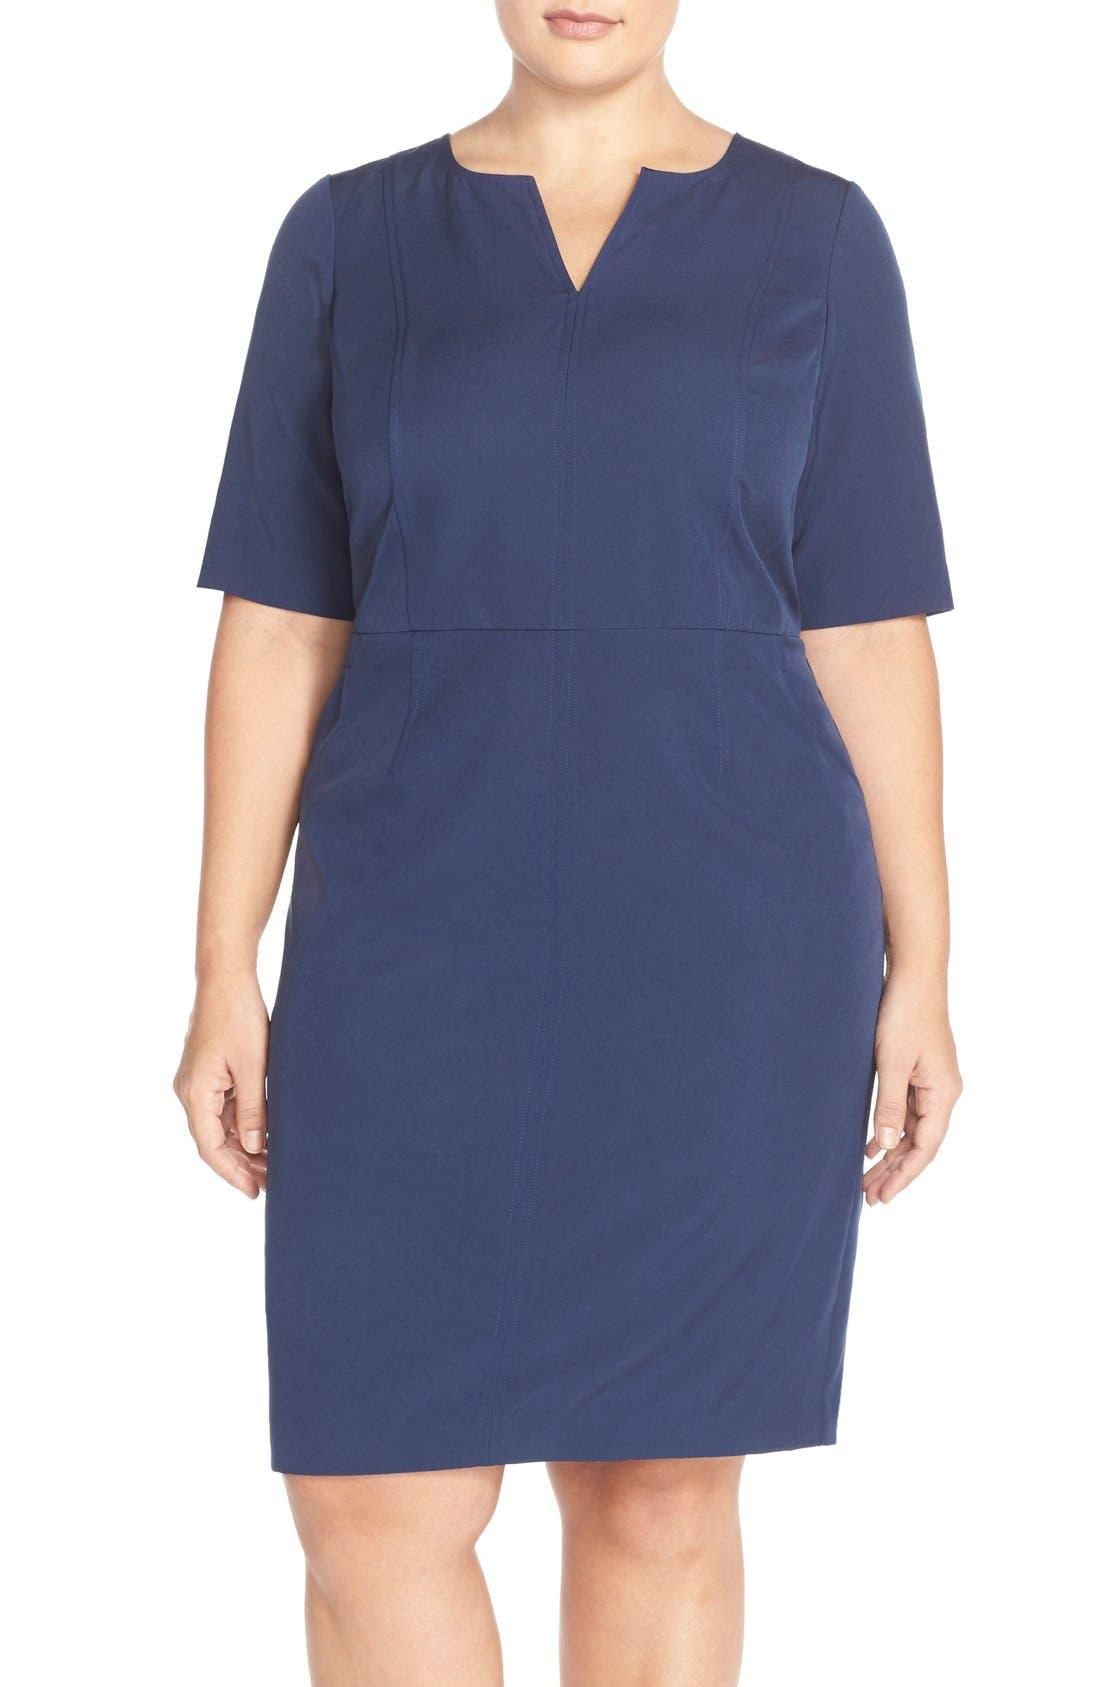 Alternate Image 1 Selected - Mynt 1792 Seam Detail Stretch Crepe Sheath Dress (Plus Size)